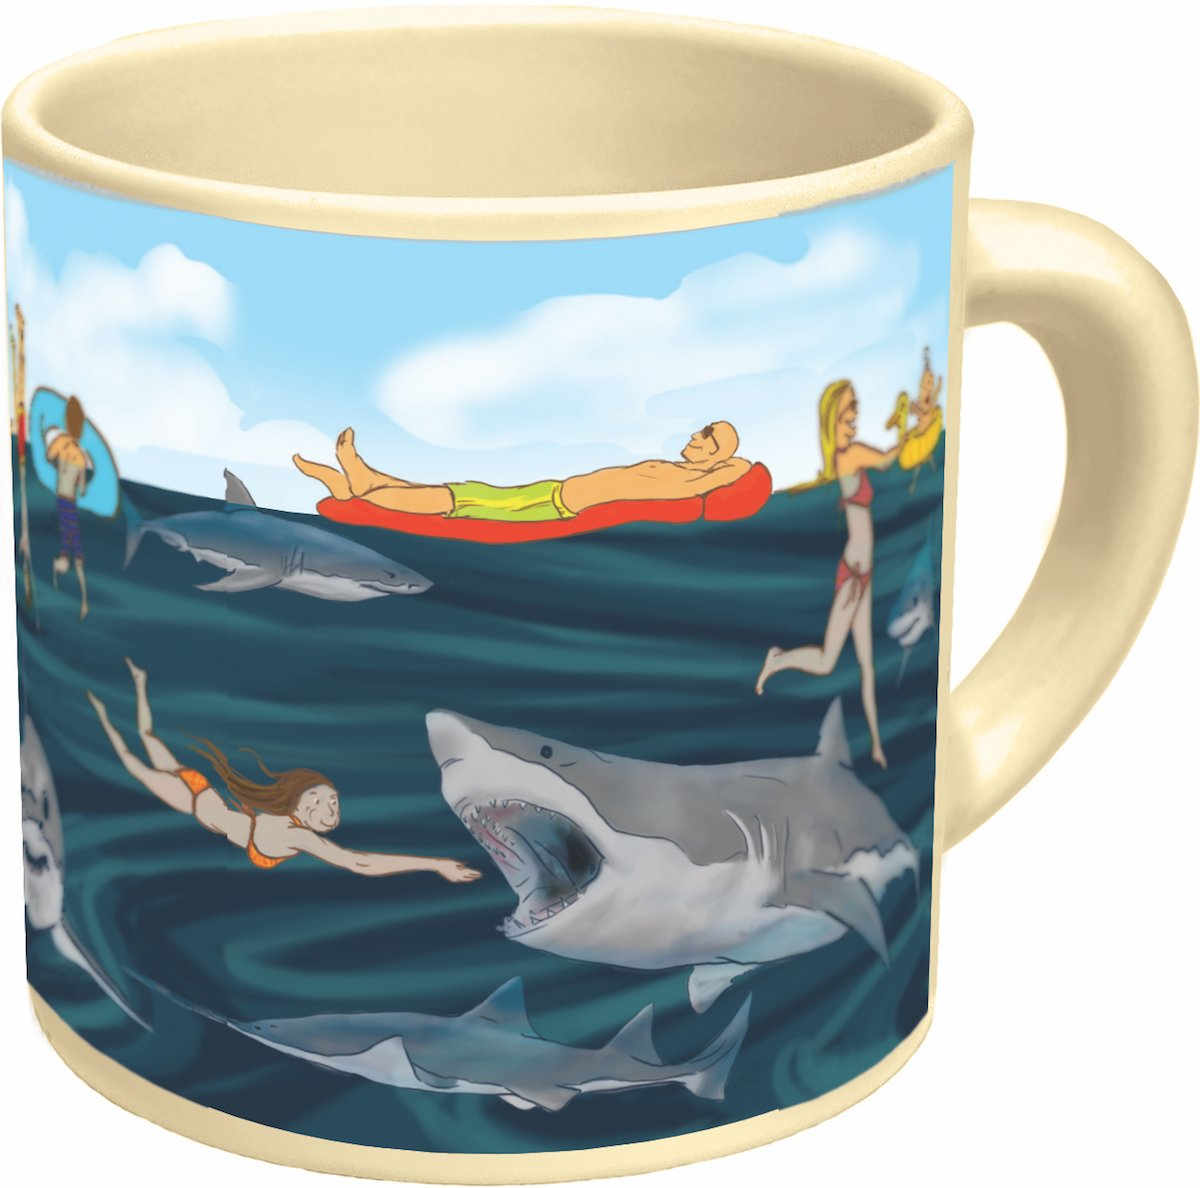 Amazoncom Shark Heat Changing Mug Add Coffee or Tea and Sharks